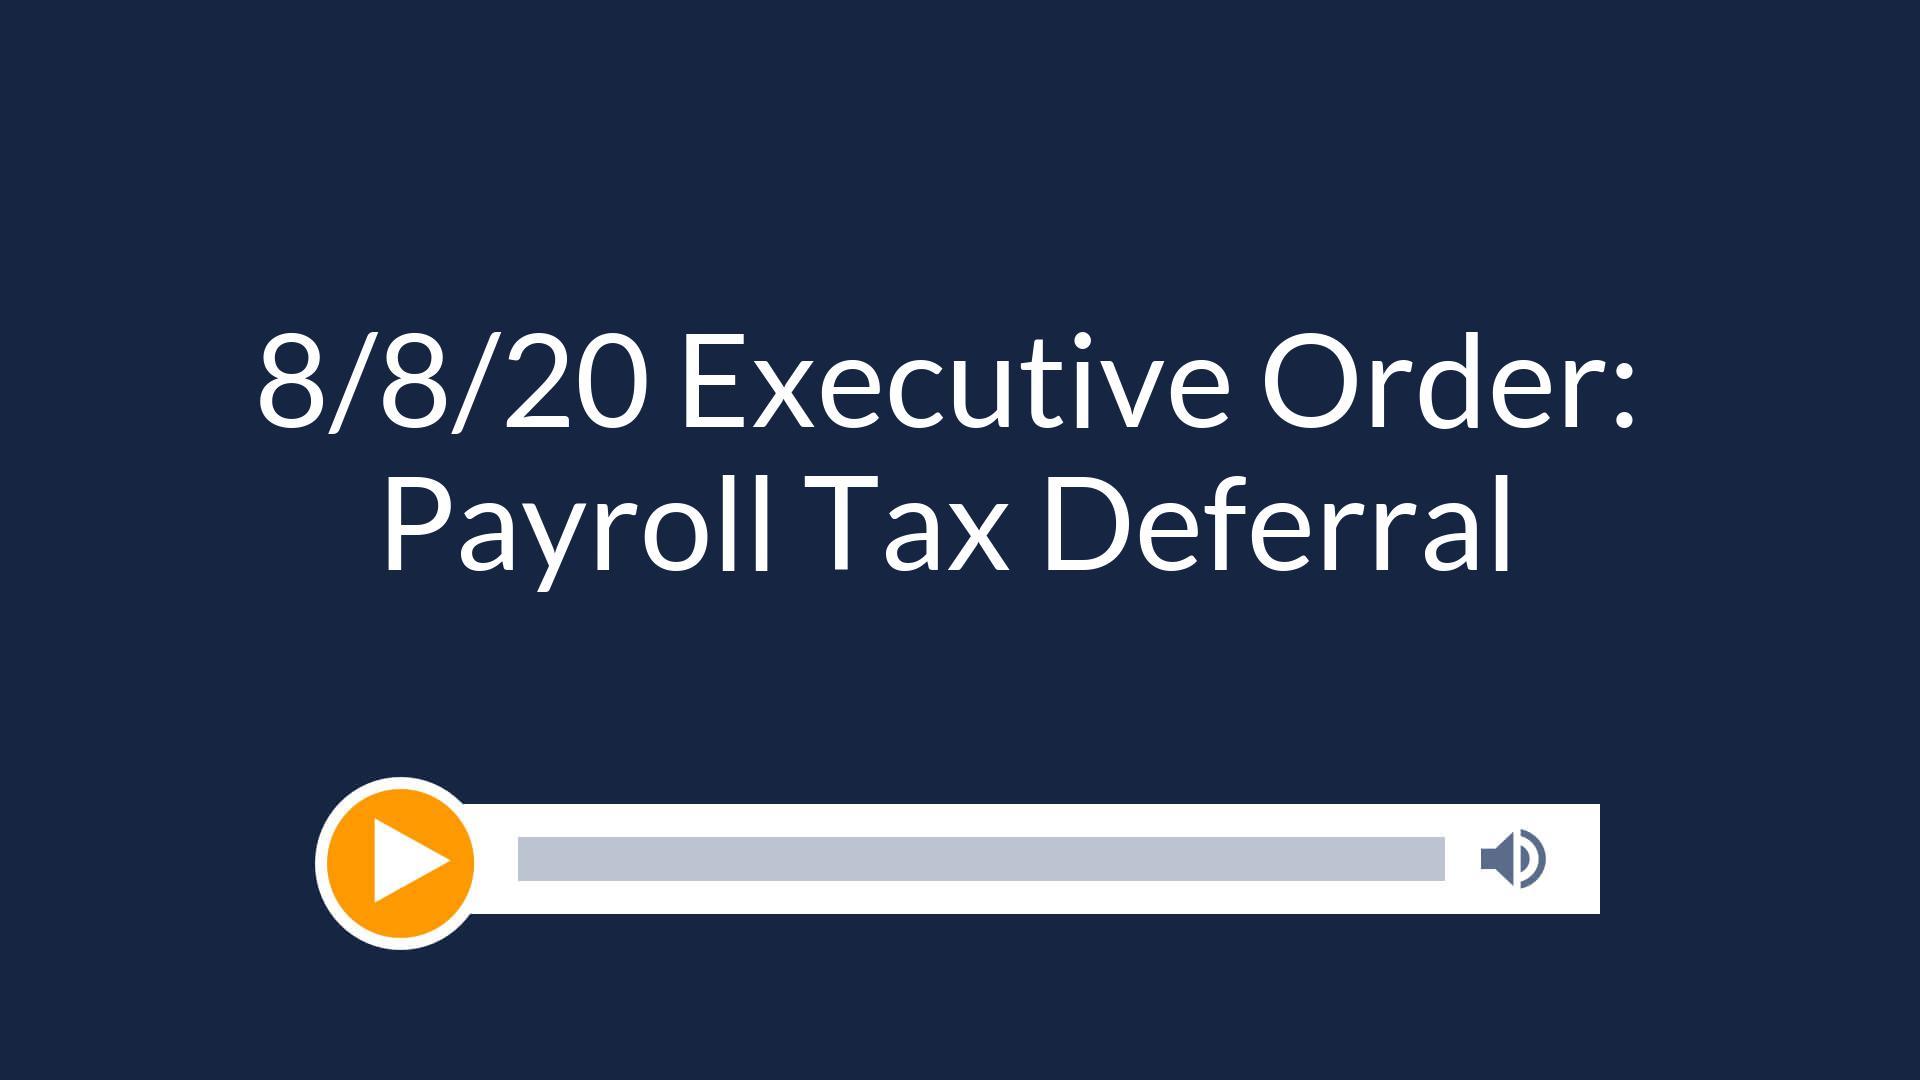 8/8/20 Executive Order: Payroll Tax Deferral